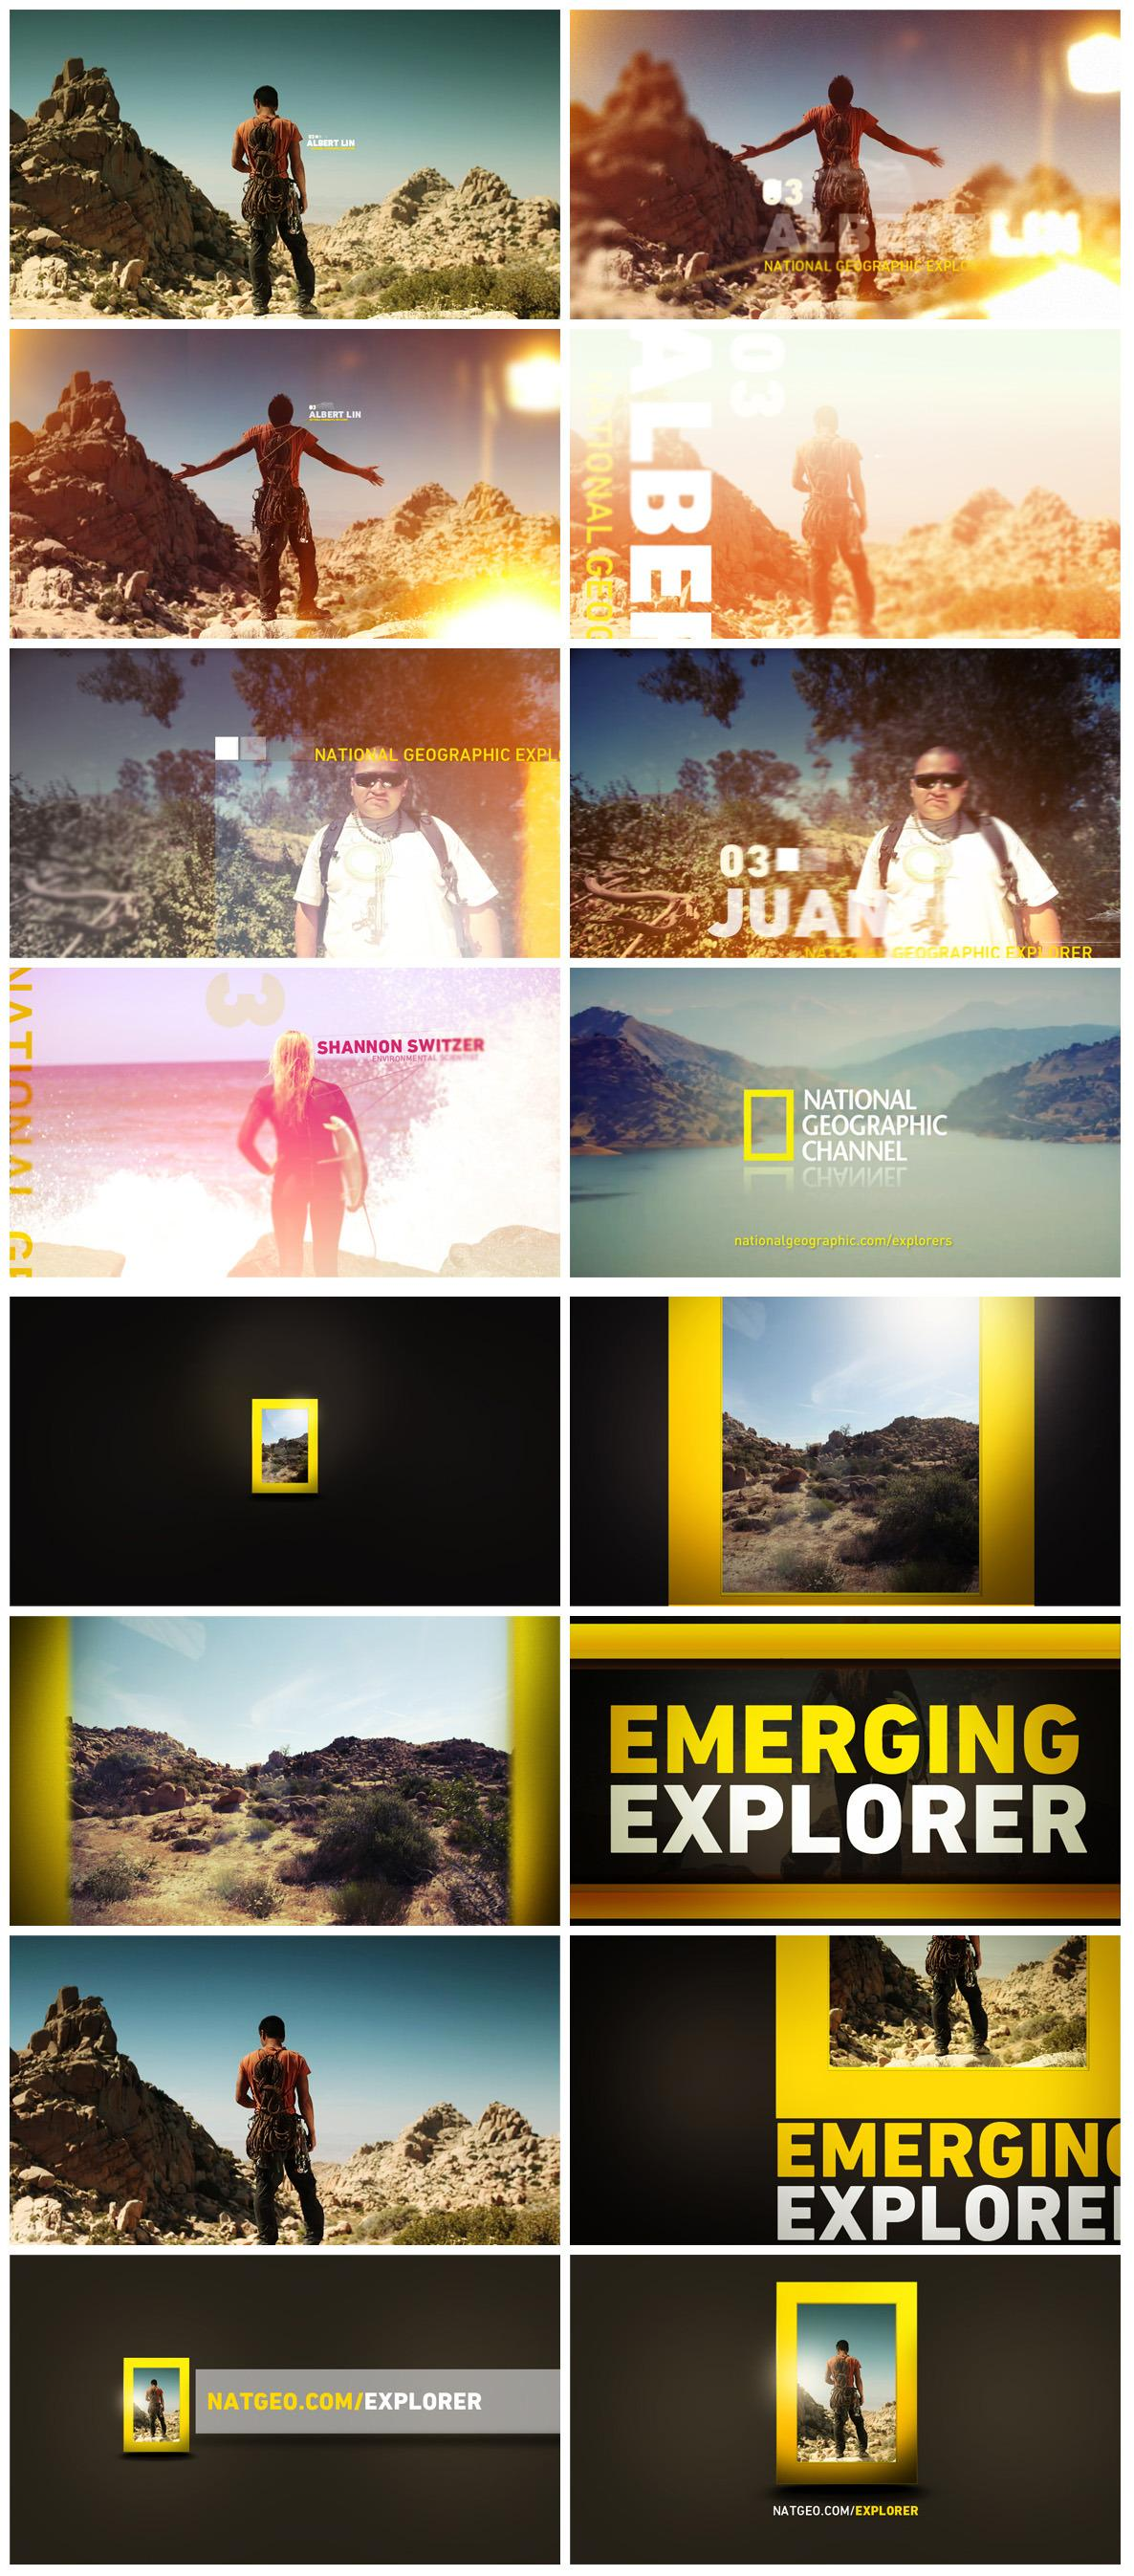 National Geographic Explorer - Nate Howe Freelance Design + Art Direction